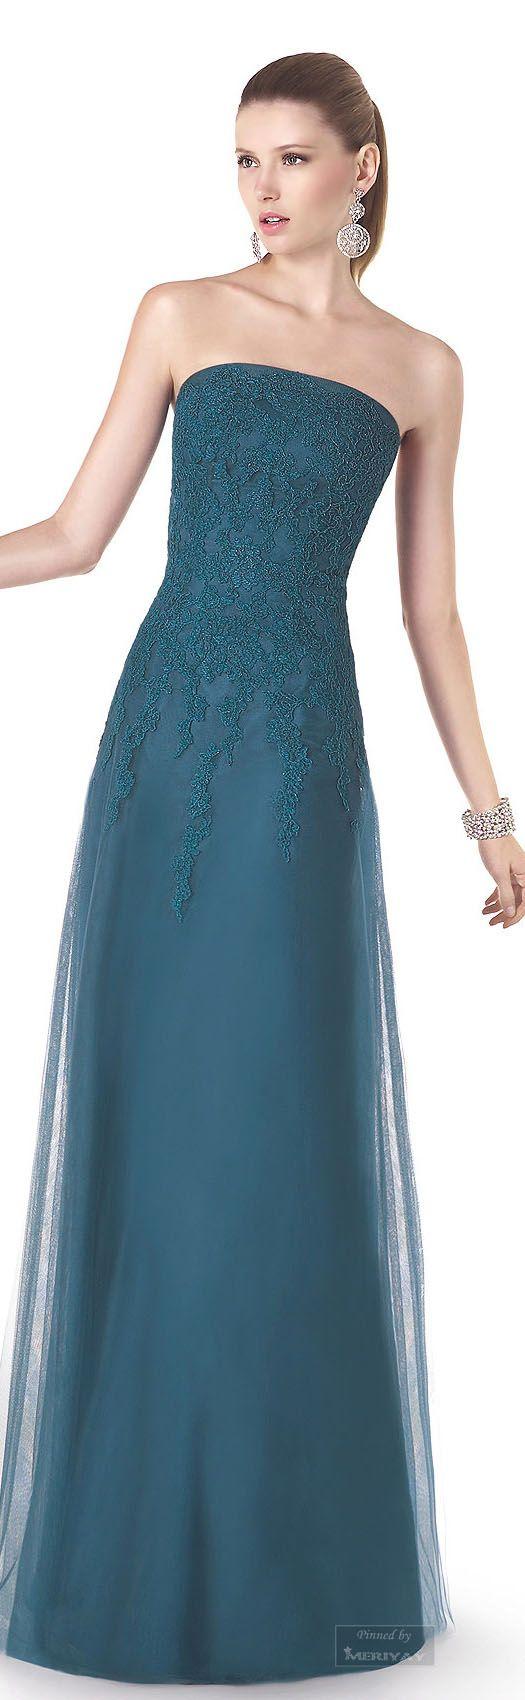 St. Patrick.2015. | Vestido coctel | Pinterest | Vestidos de fiesta ...